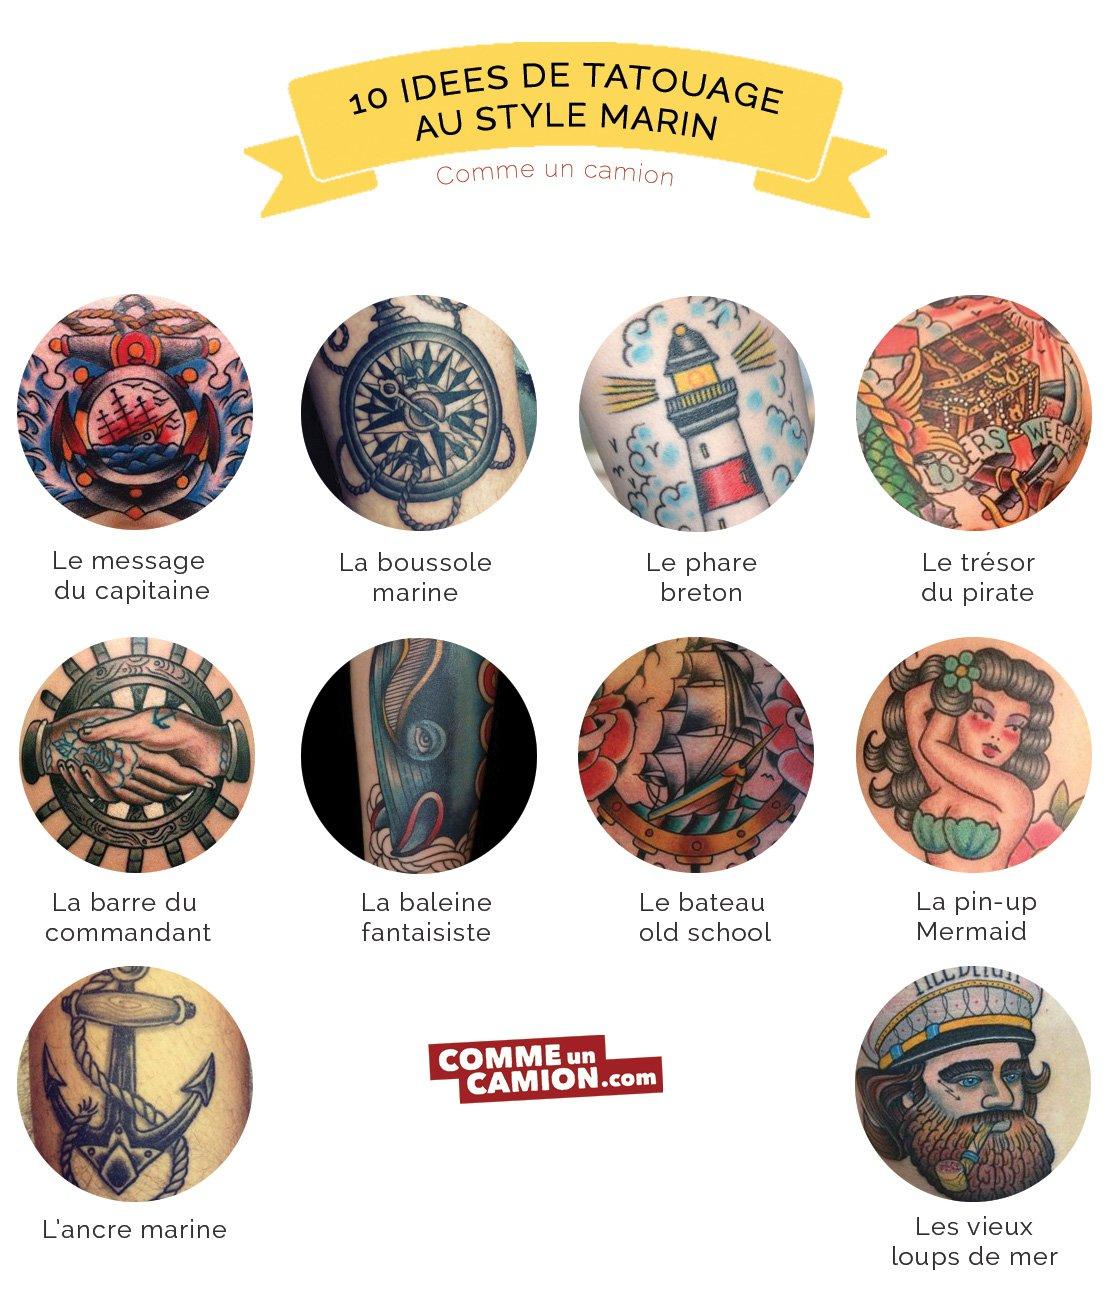 10 idées de tatouage au style marin